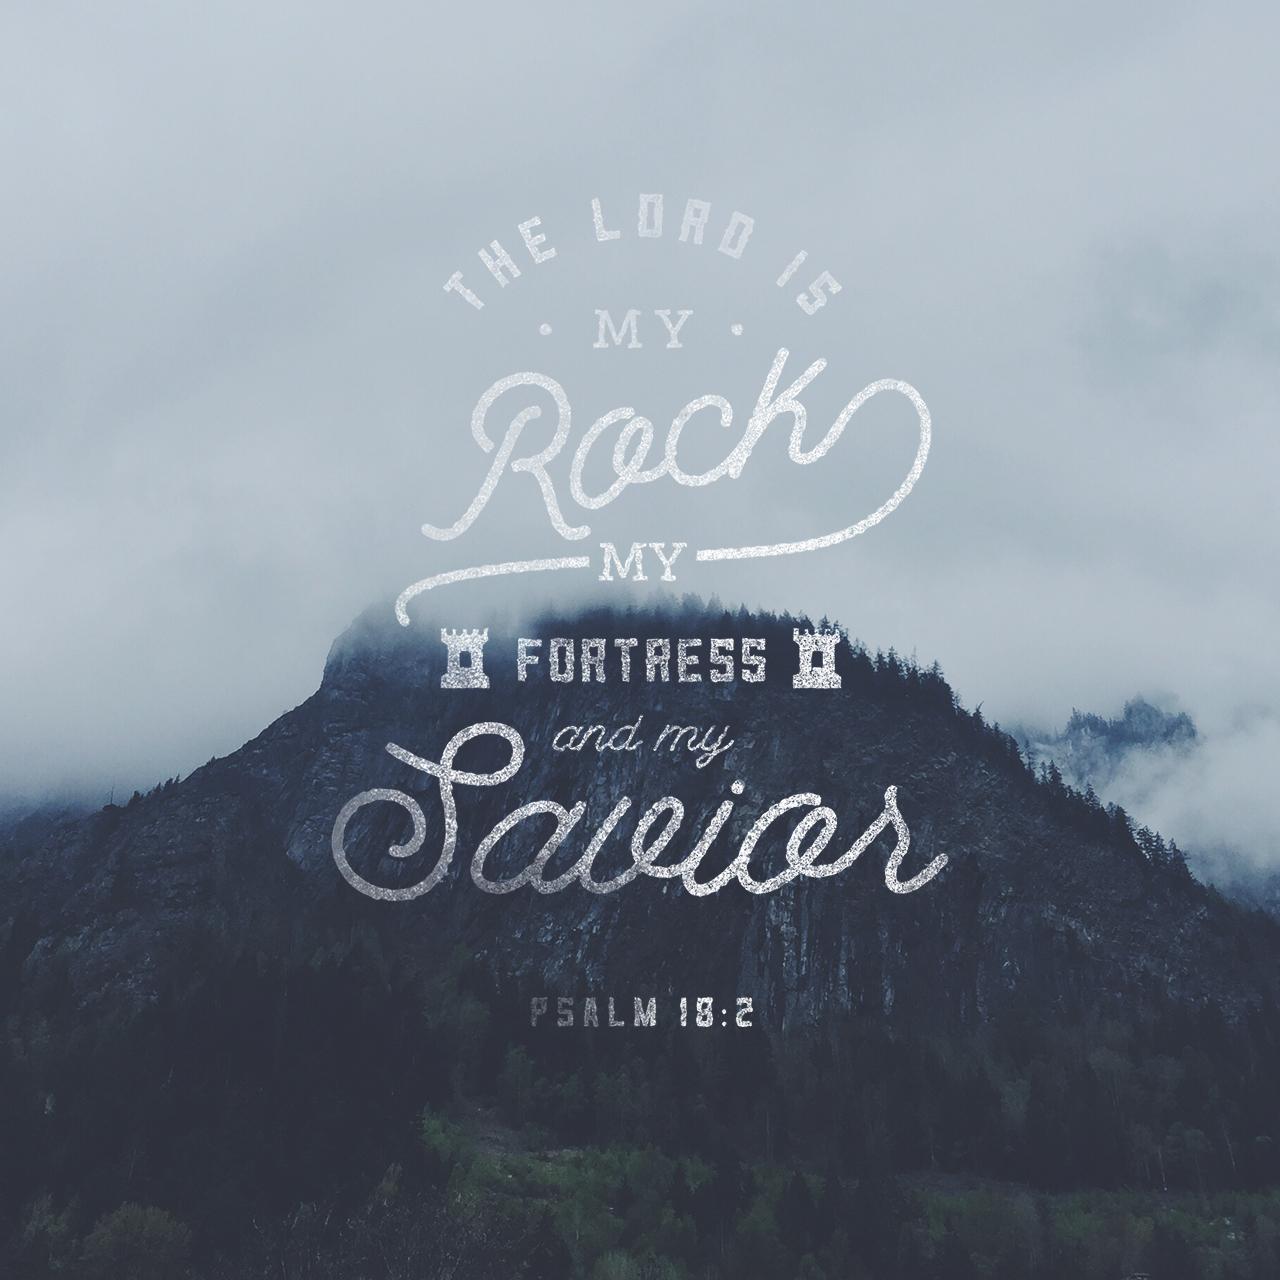 ScriptureArt_-_Psalm18_2 (1).jpg